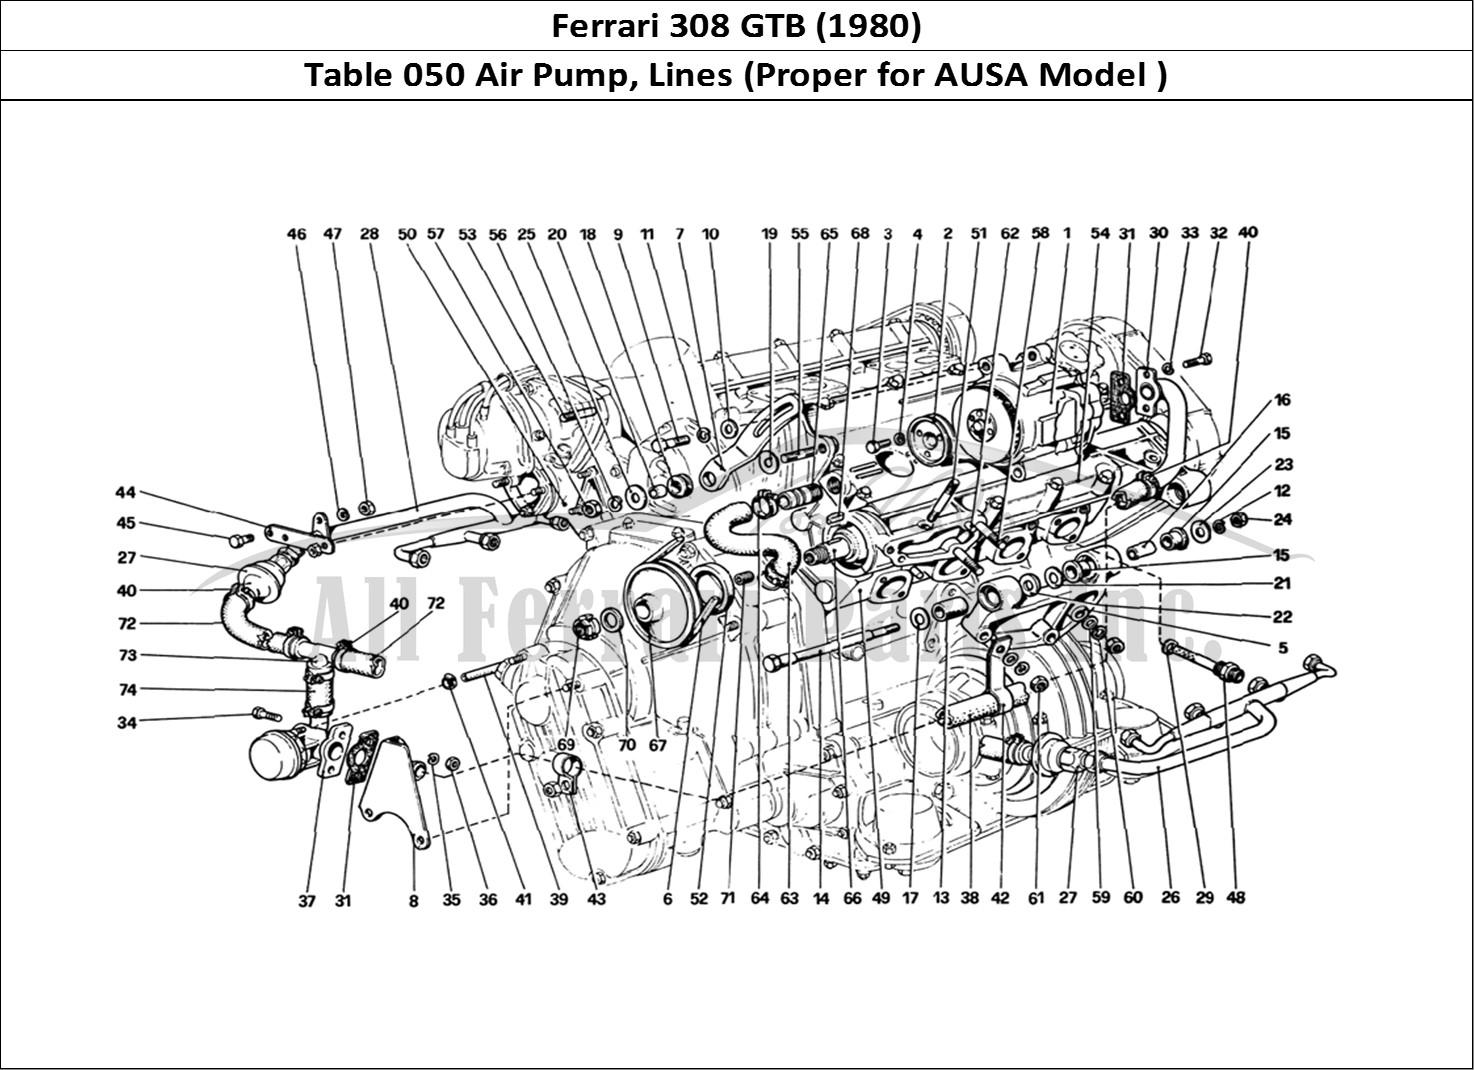 Buy original Ferrari 308 GTB (1980) 050 Air Pump, Lines